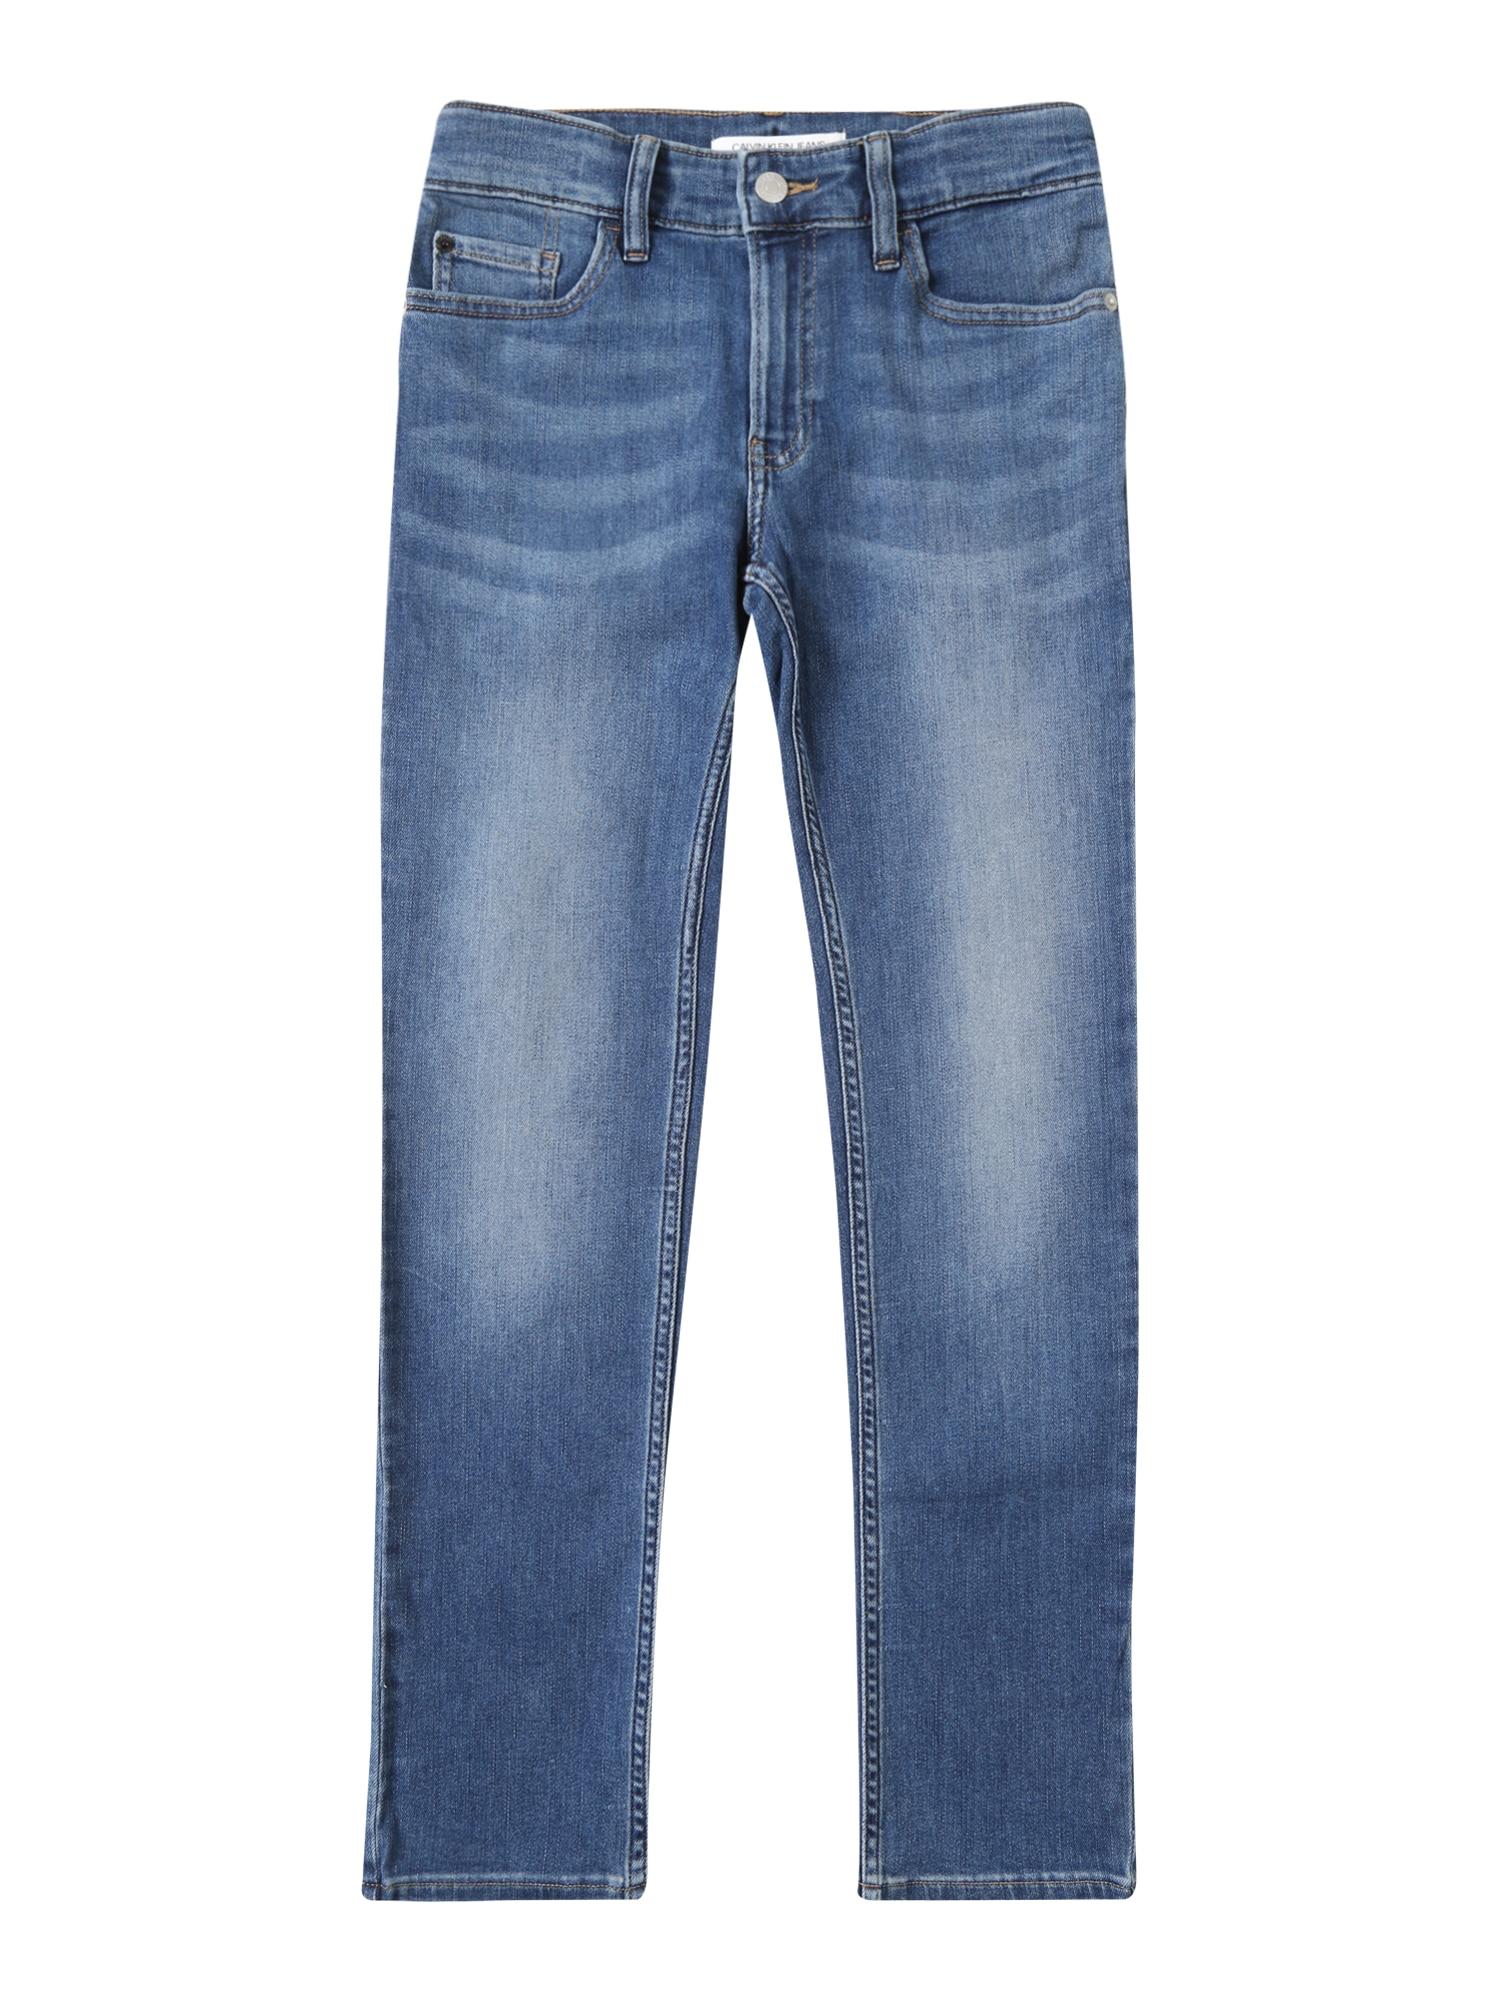 Džíny SLIM VALE MID BLUE STRETCH modrá džínovina Calvin Klein Jeans